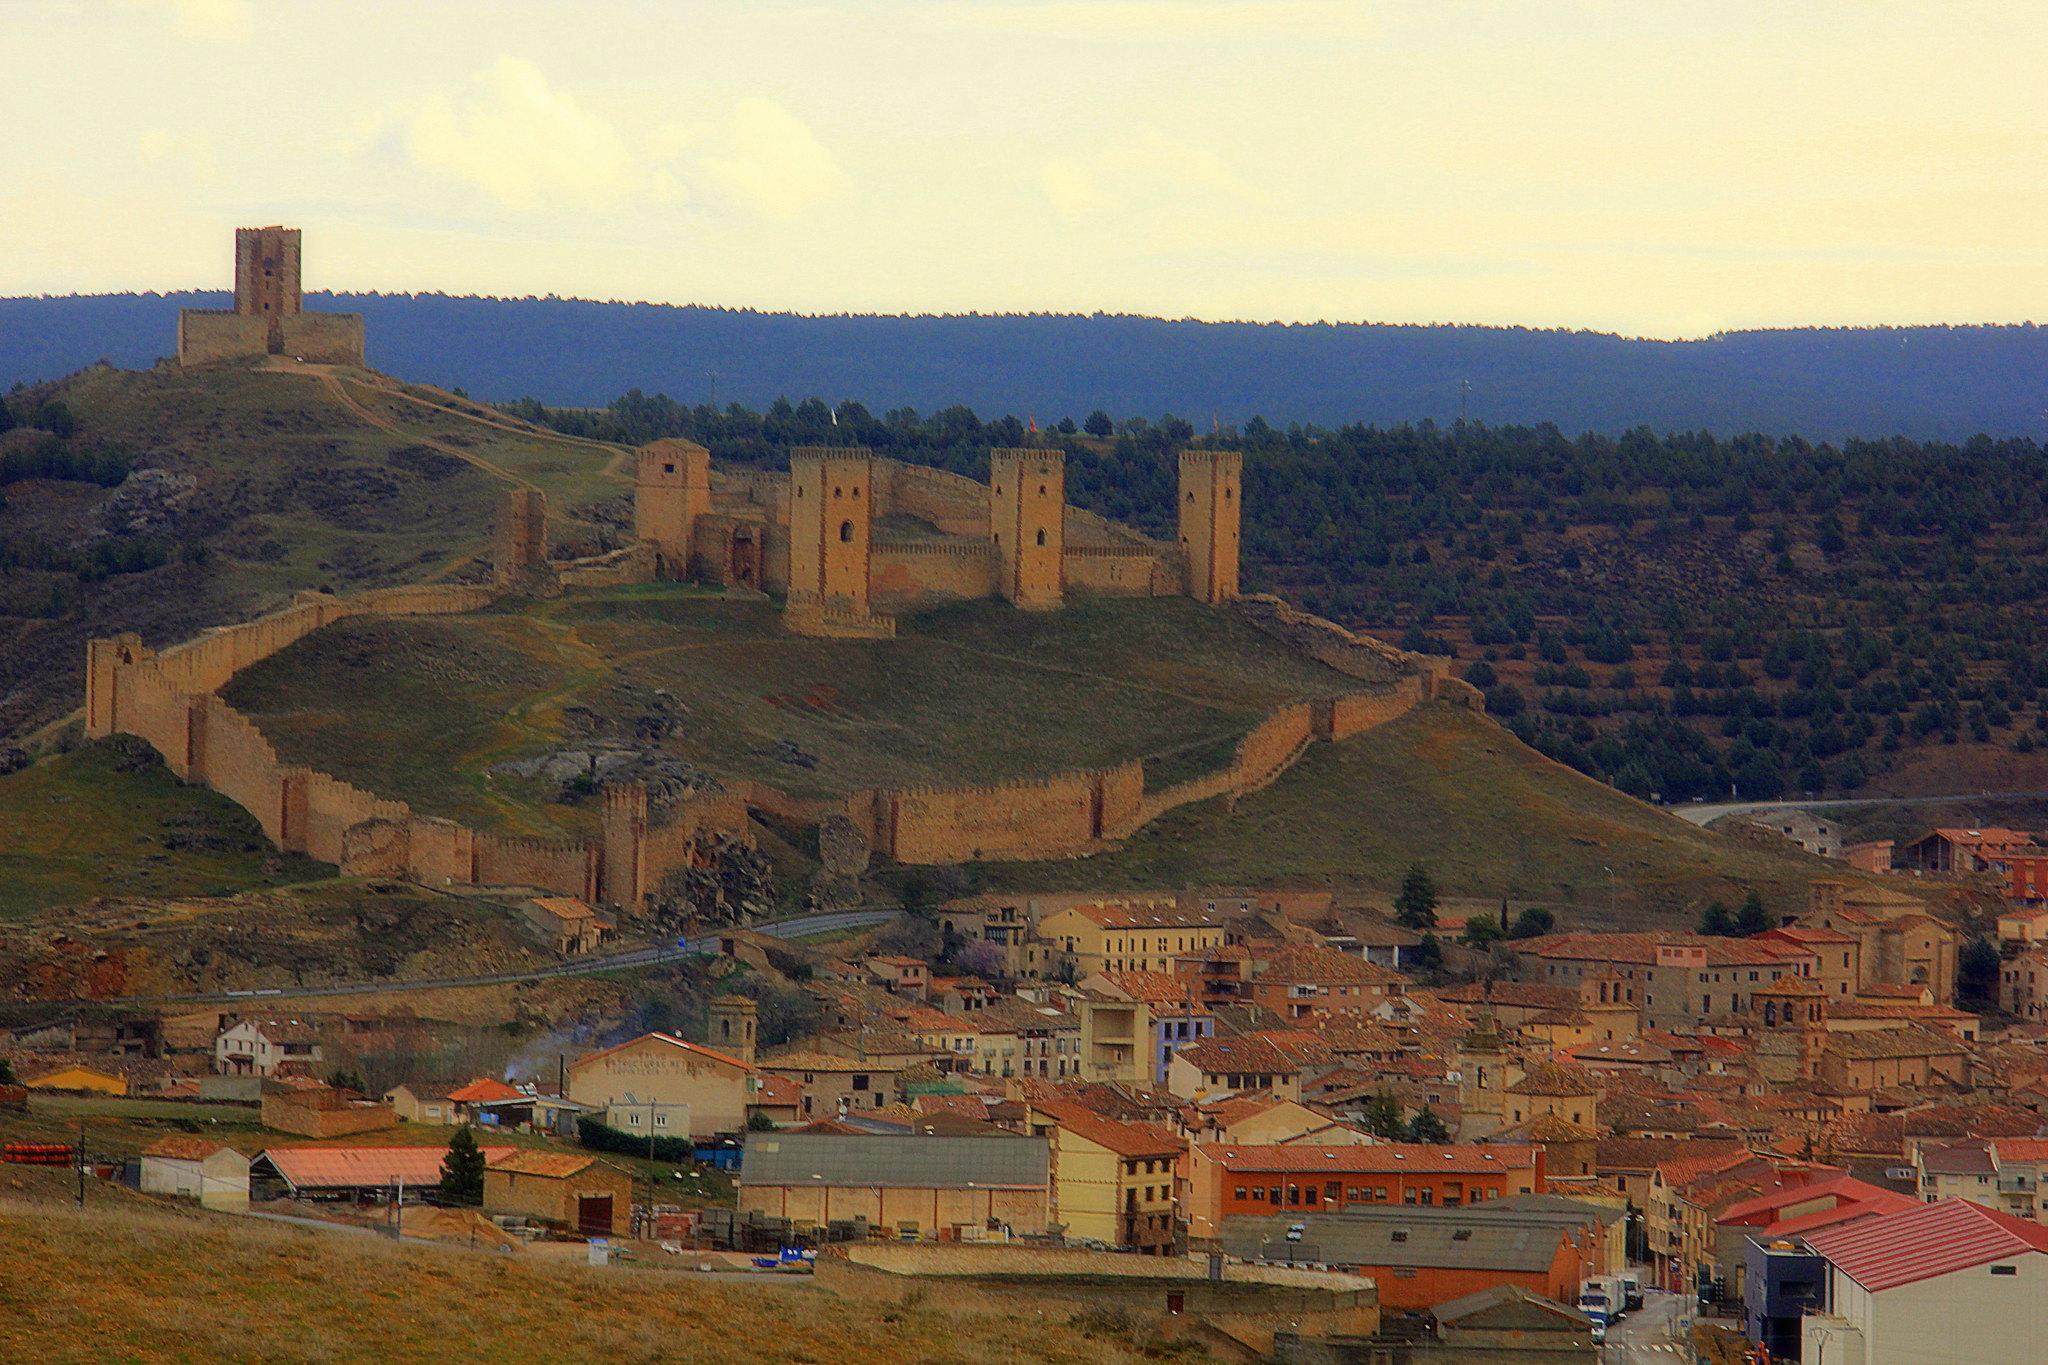 La Mancha is the land of the delusional knight, Don Quixote